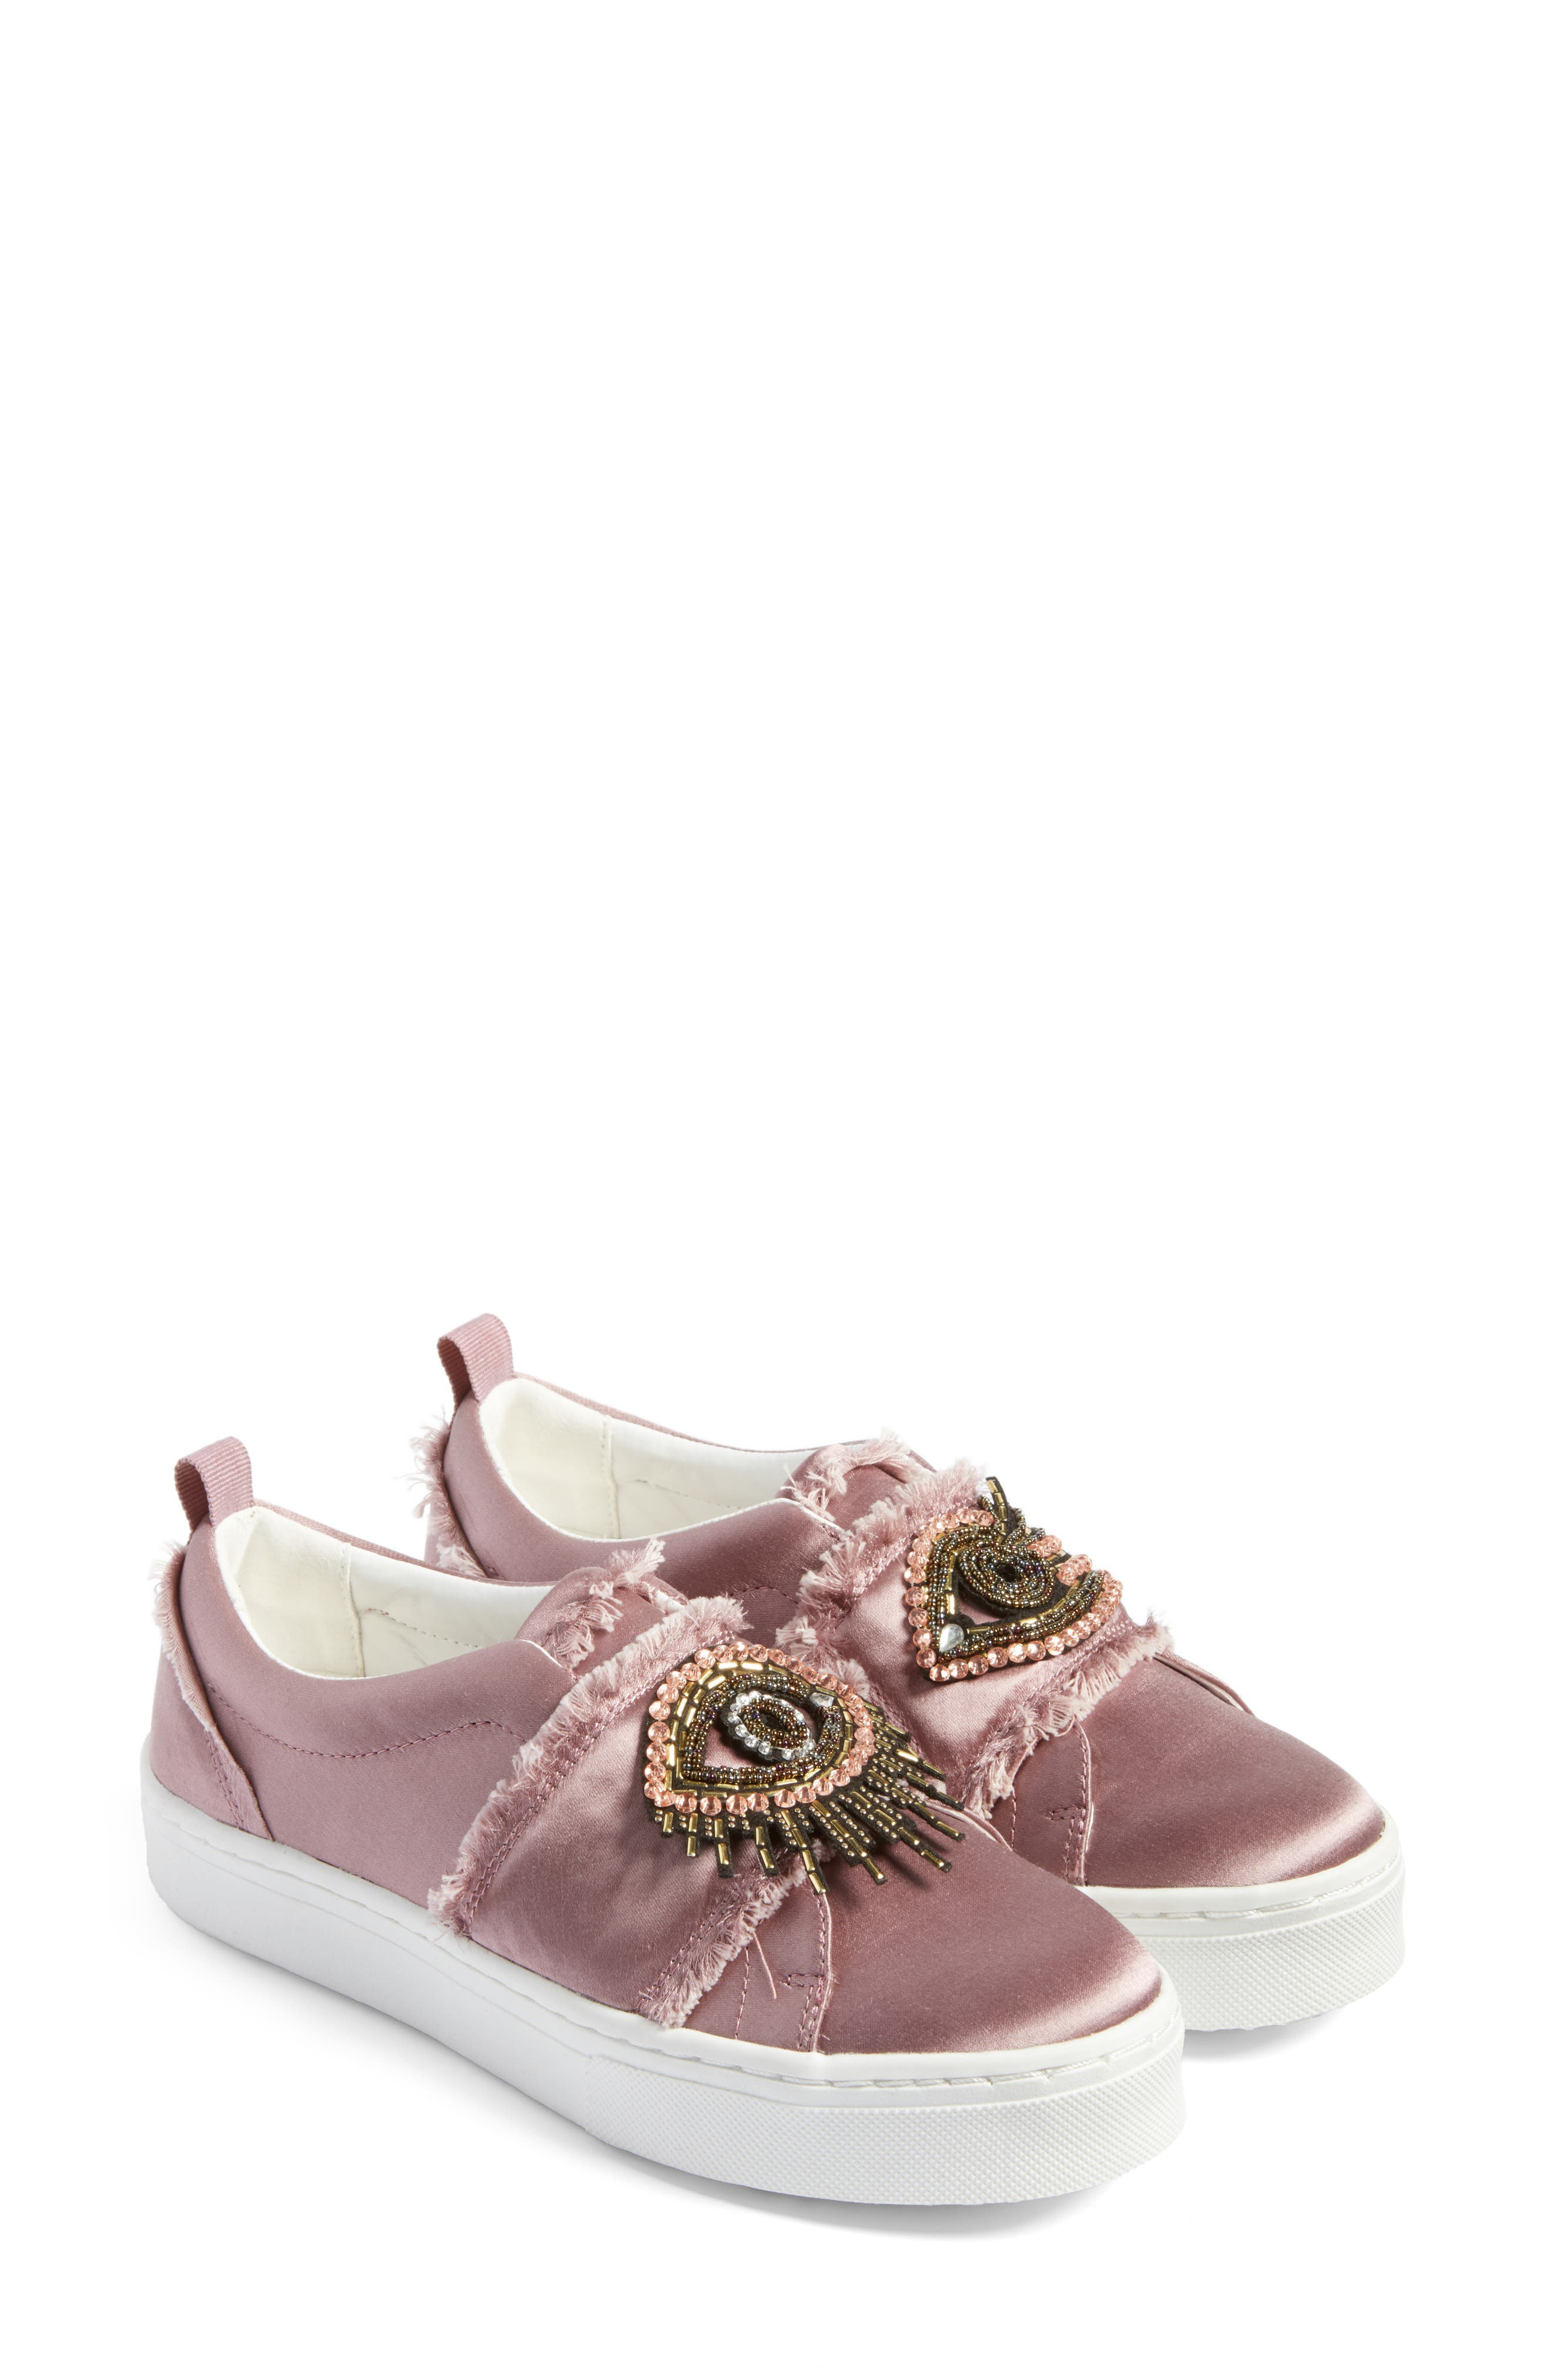 Levine Sneaker,                         Main,                         color, Pearl Pink Satin